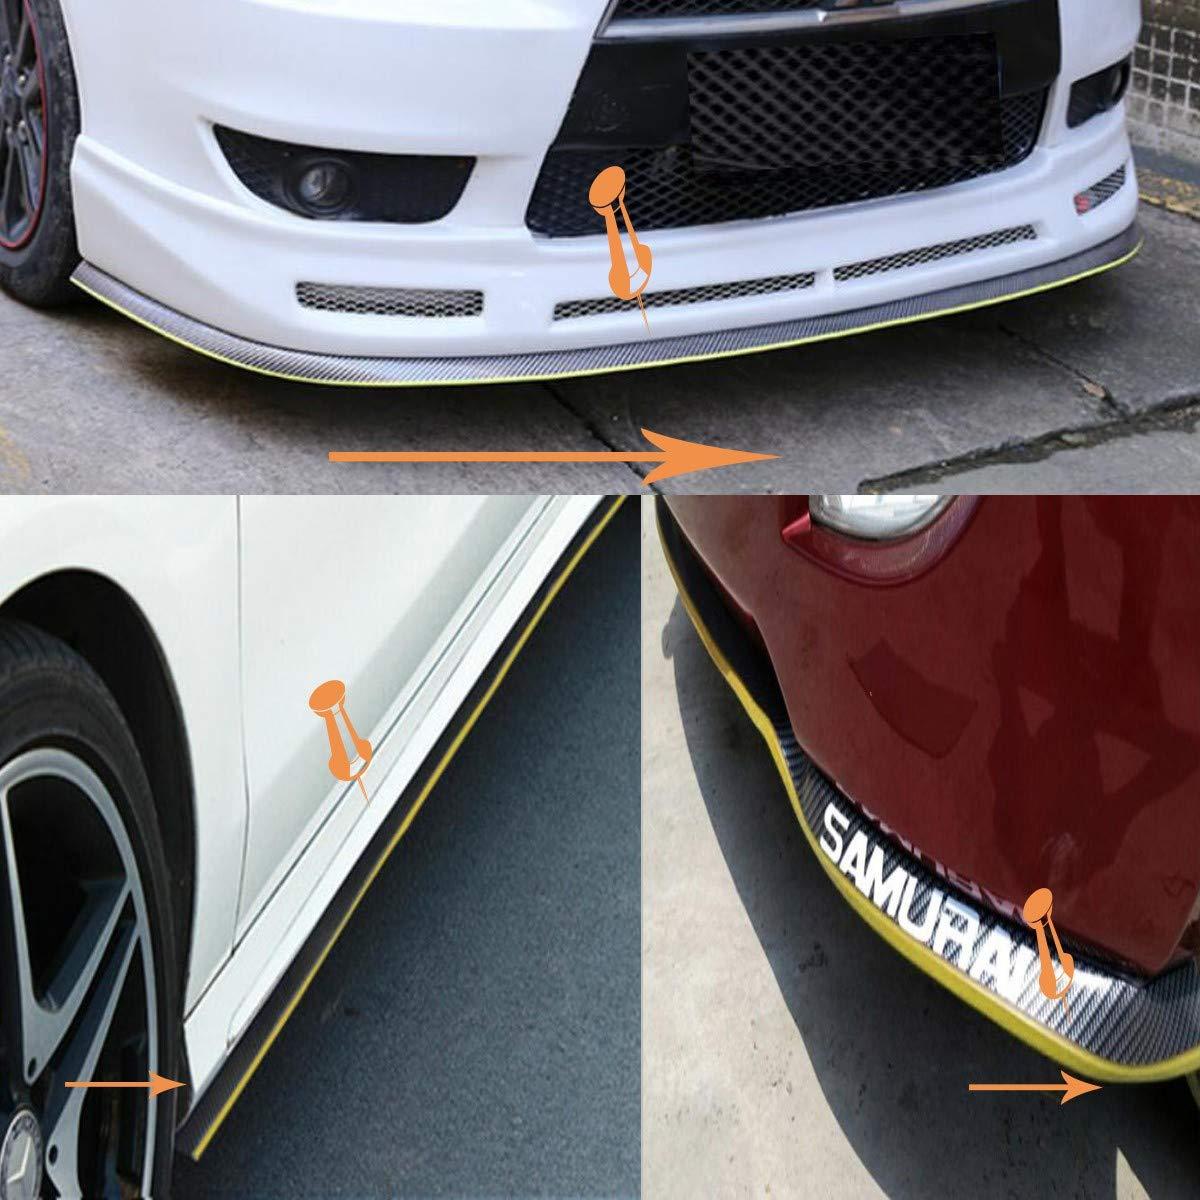 Special Universal Rubber Carbon Fiber Bumper Front Lip;Suitable for Side Skirt Lip Separator 2.5m,Golden Front Bumper Lip Spoiler,100/% Waterproof and Durable ByLucky